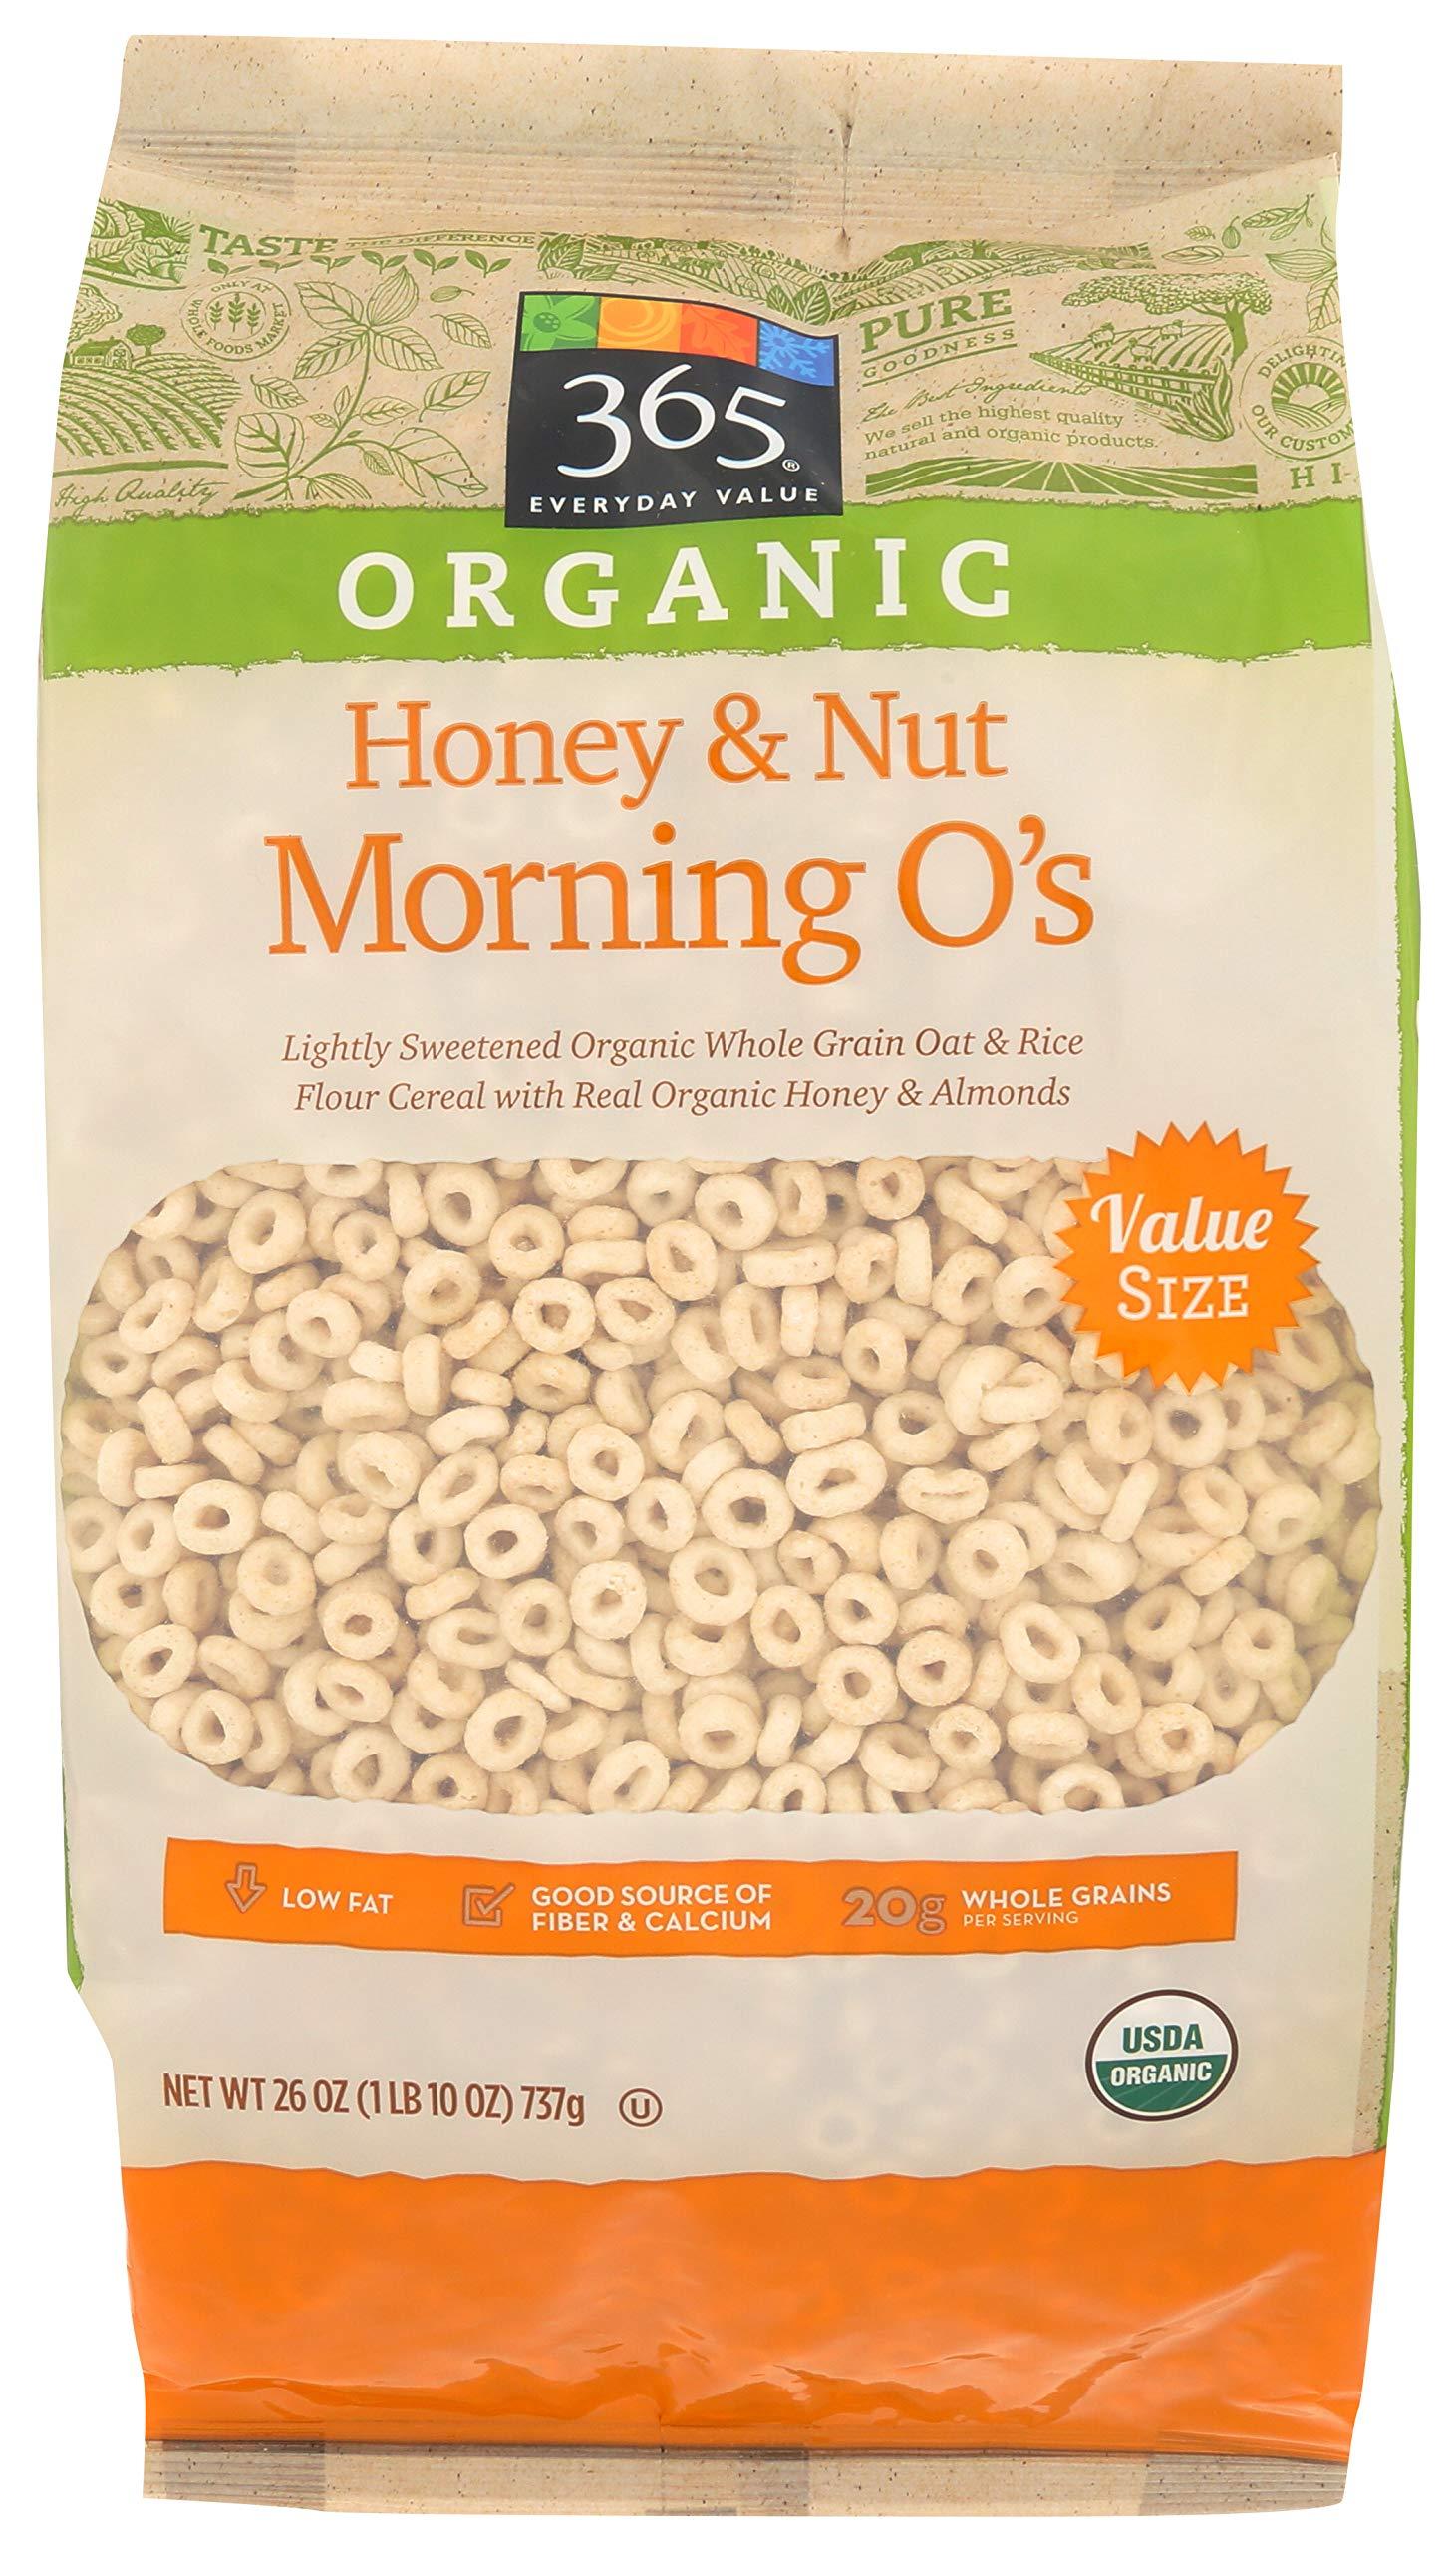 365 Everyday Value, Organic Honey & Nut Morning O's, 26 oz